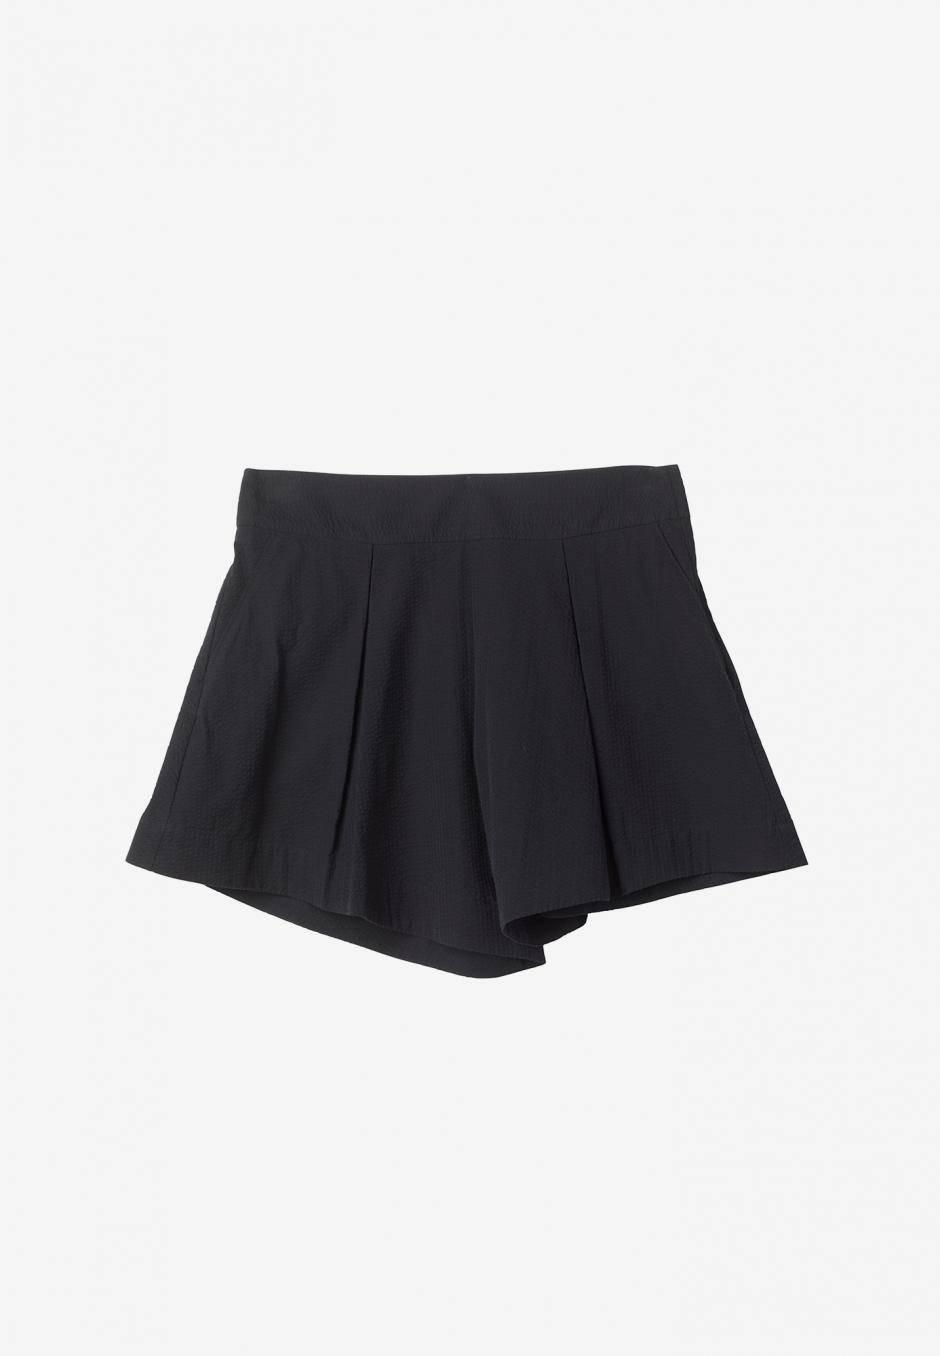 Stylein Salles Shorts